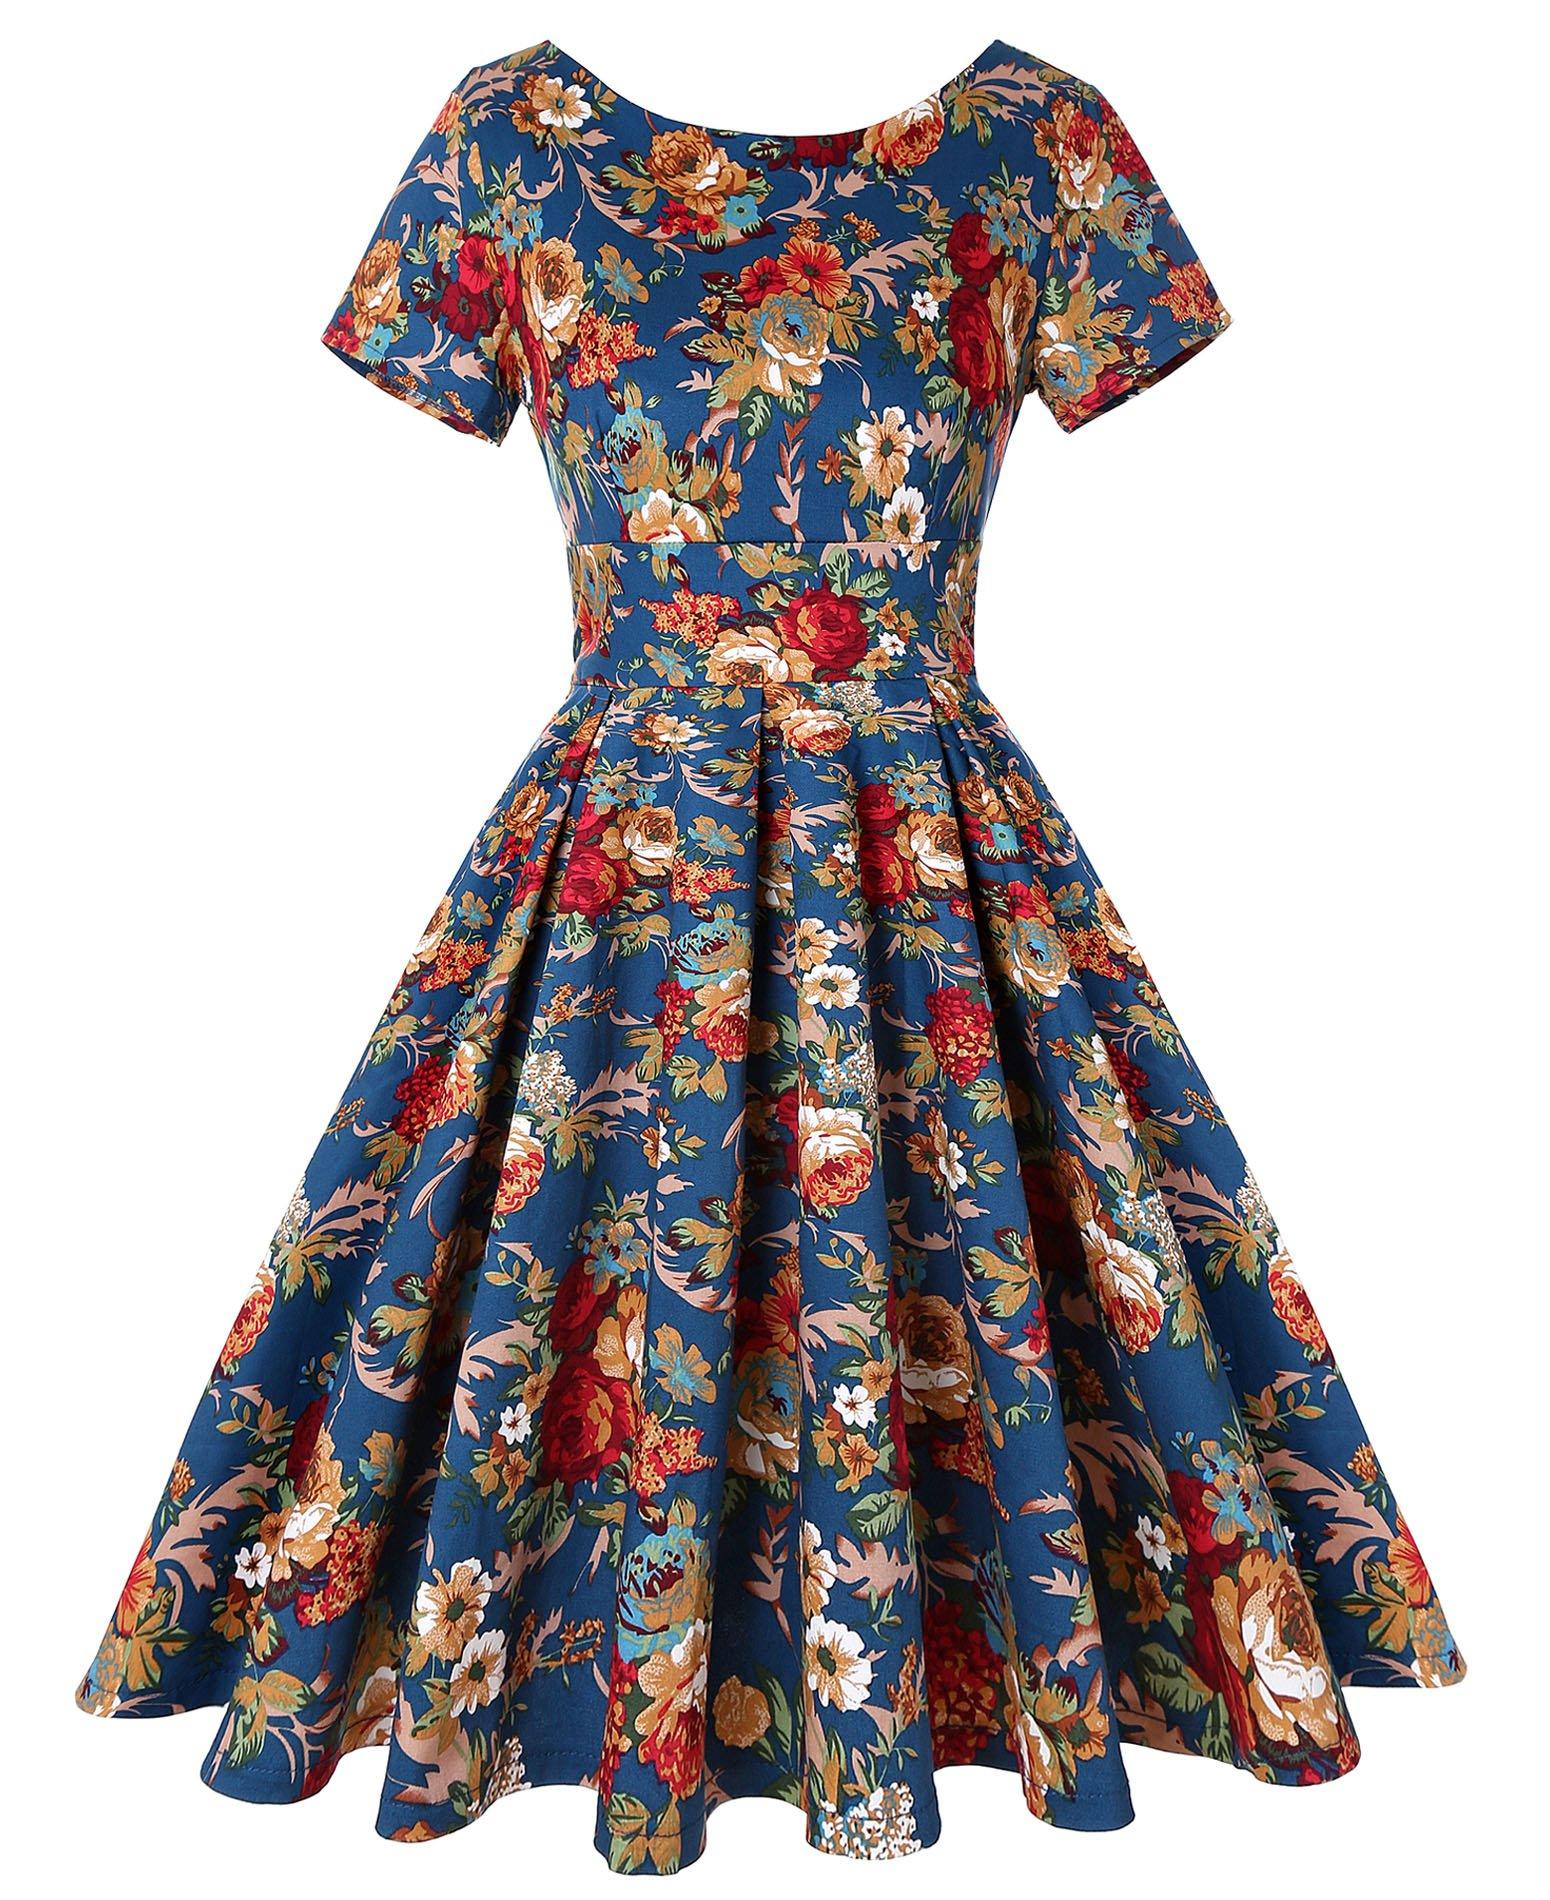 ROOSEY Women's Vintage 1950s Retro Rockabilly Prom Dresses Short Sleeve